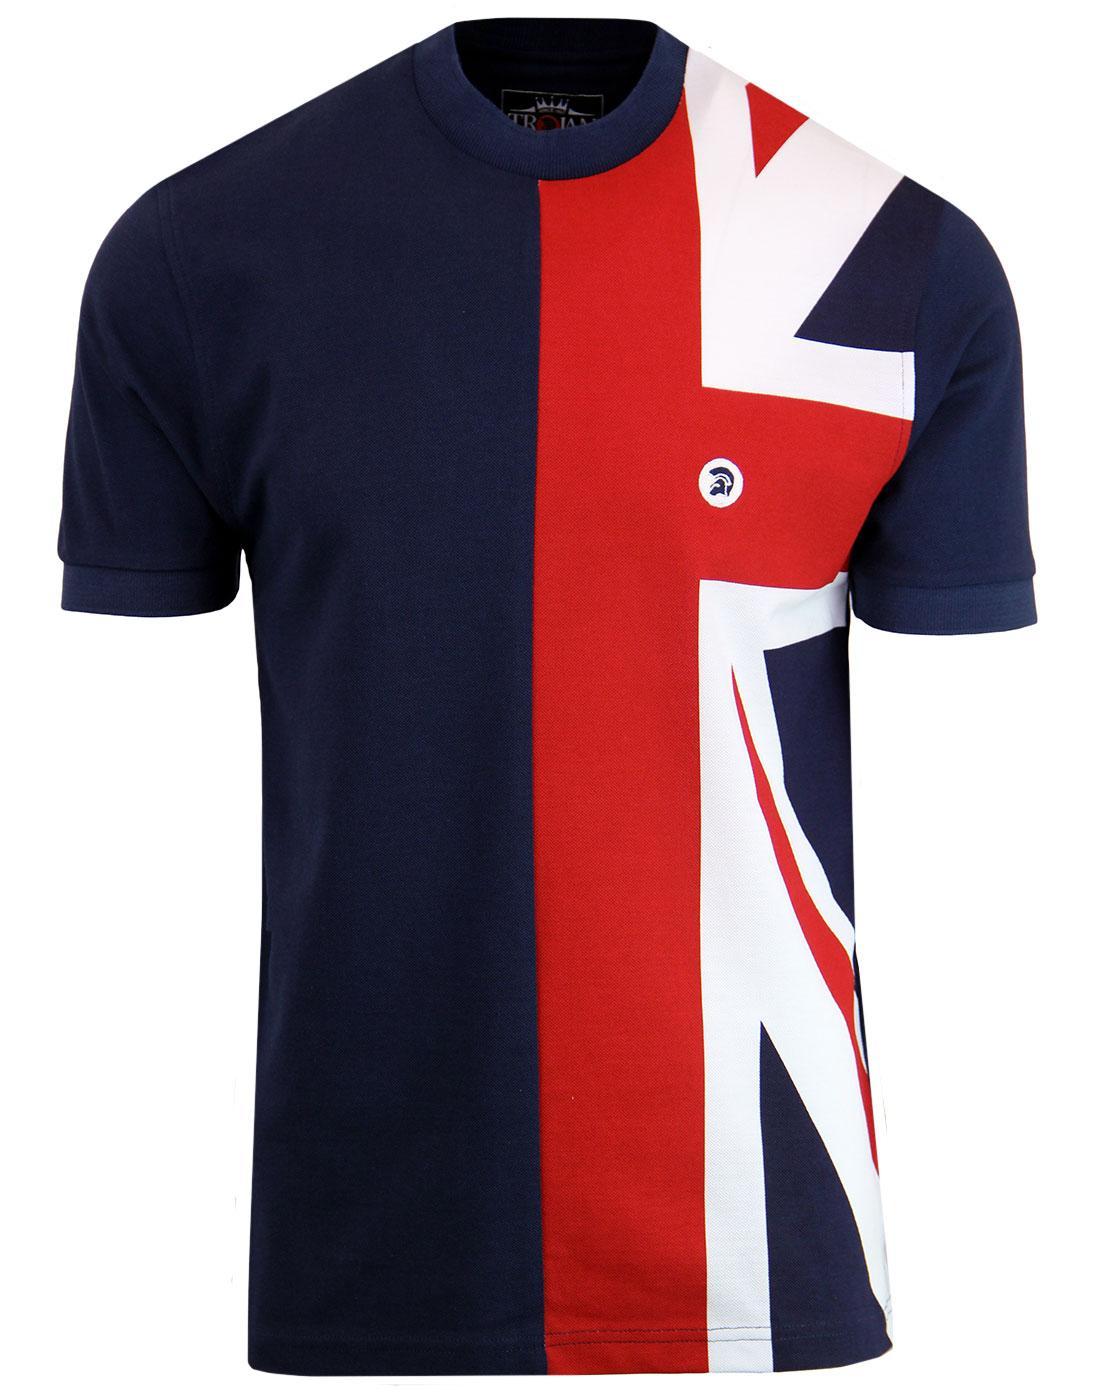 TROJAN RECORDS Mod Union Jack Pique T-shirt NAVY